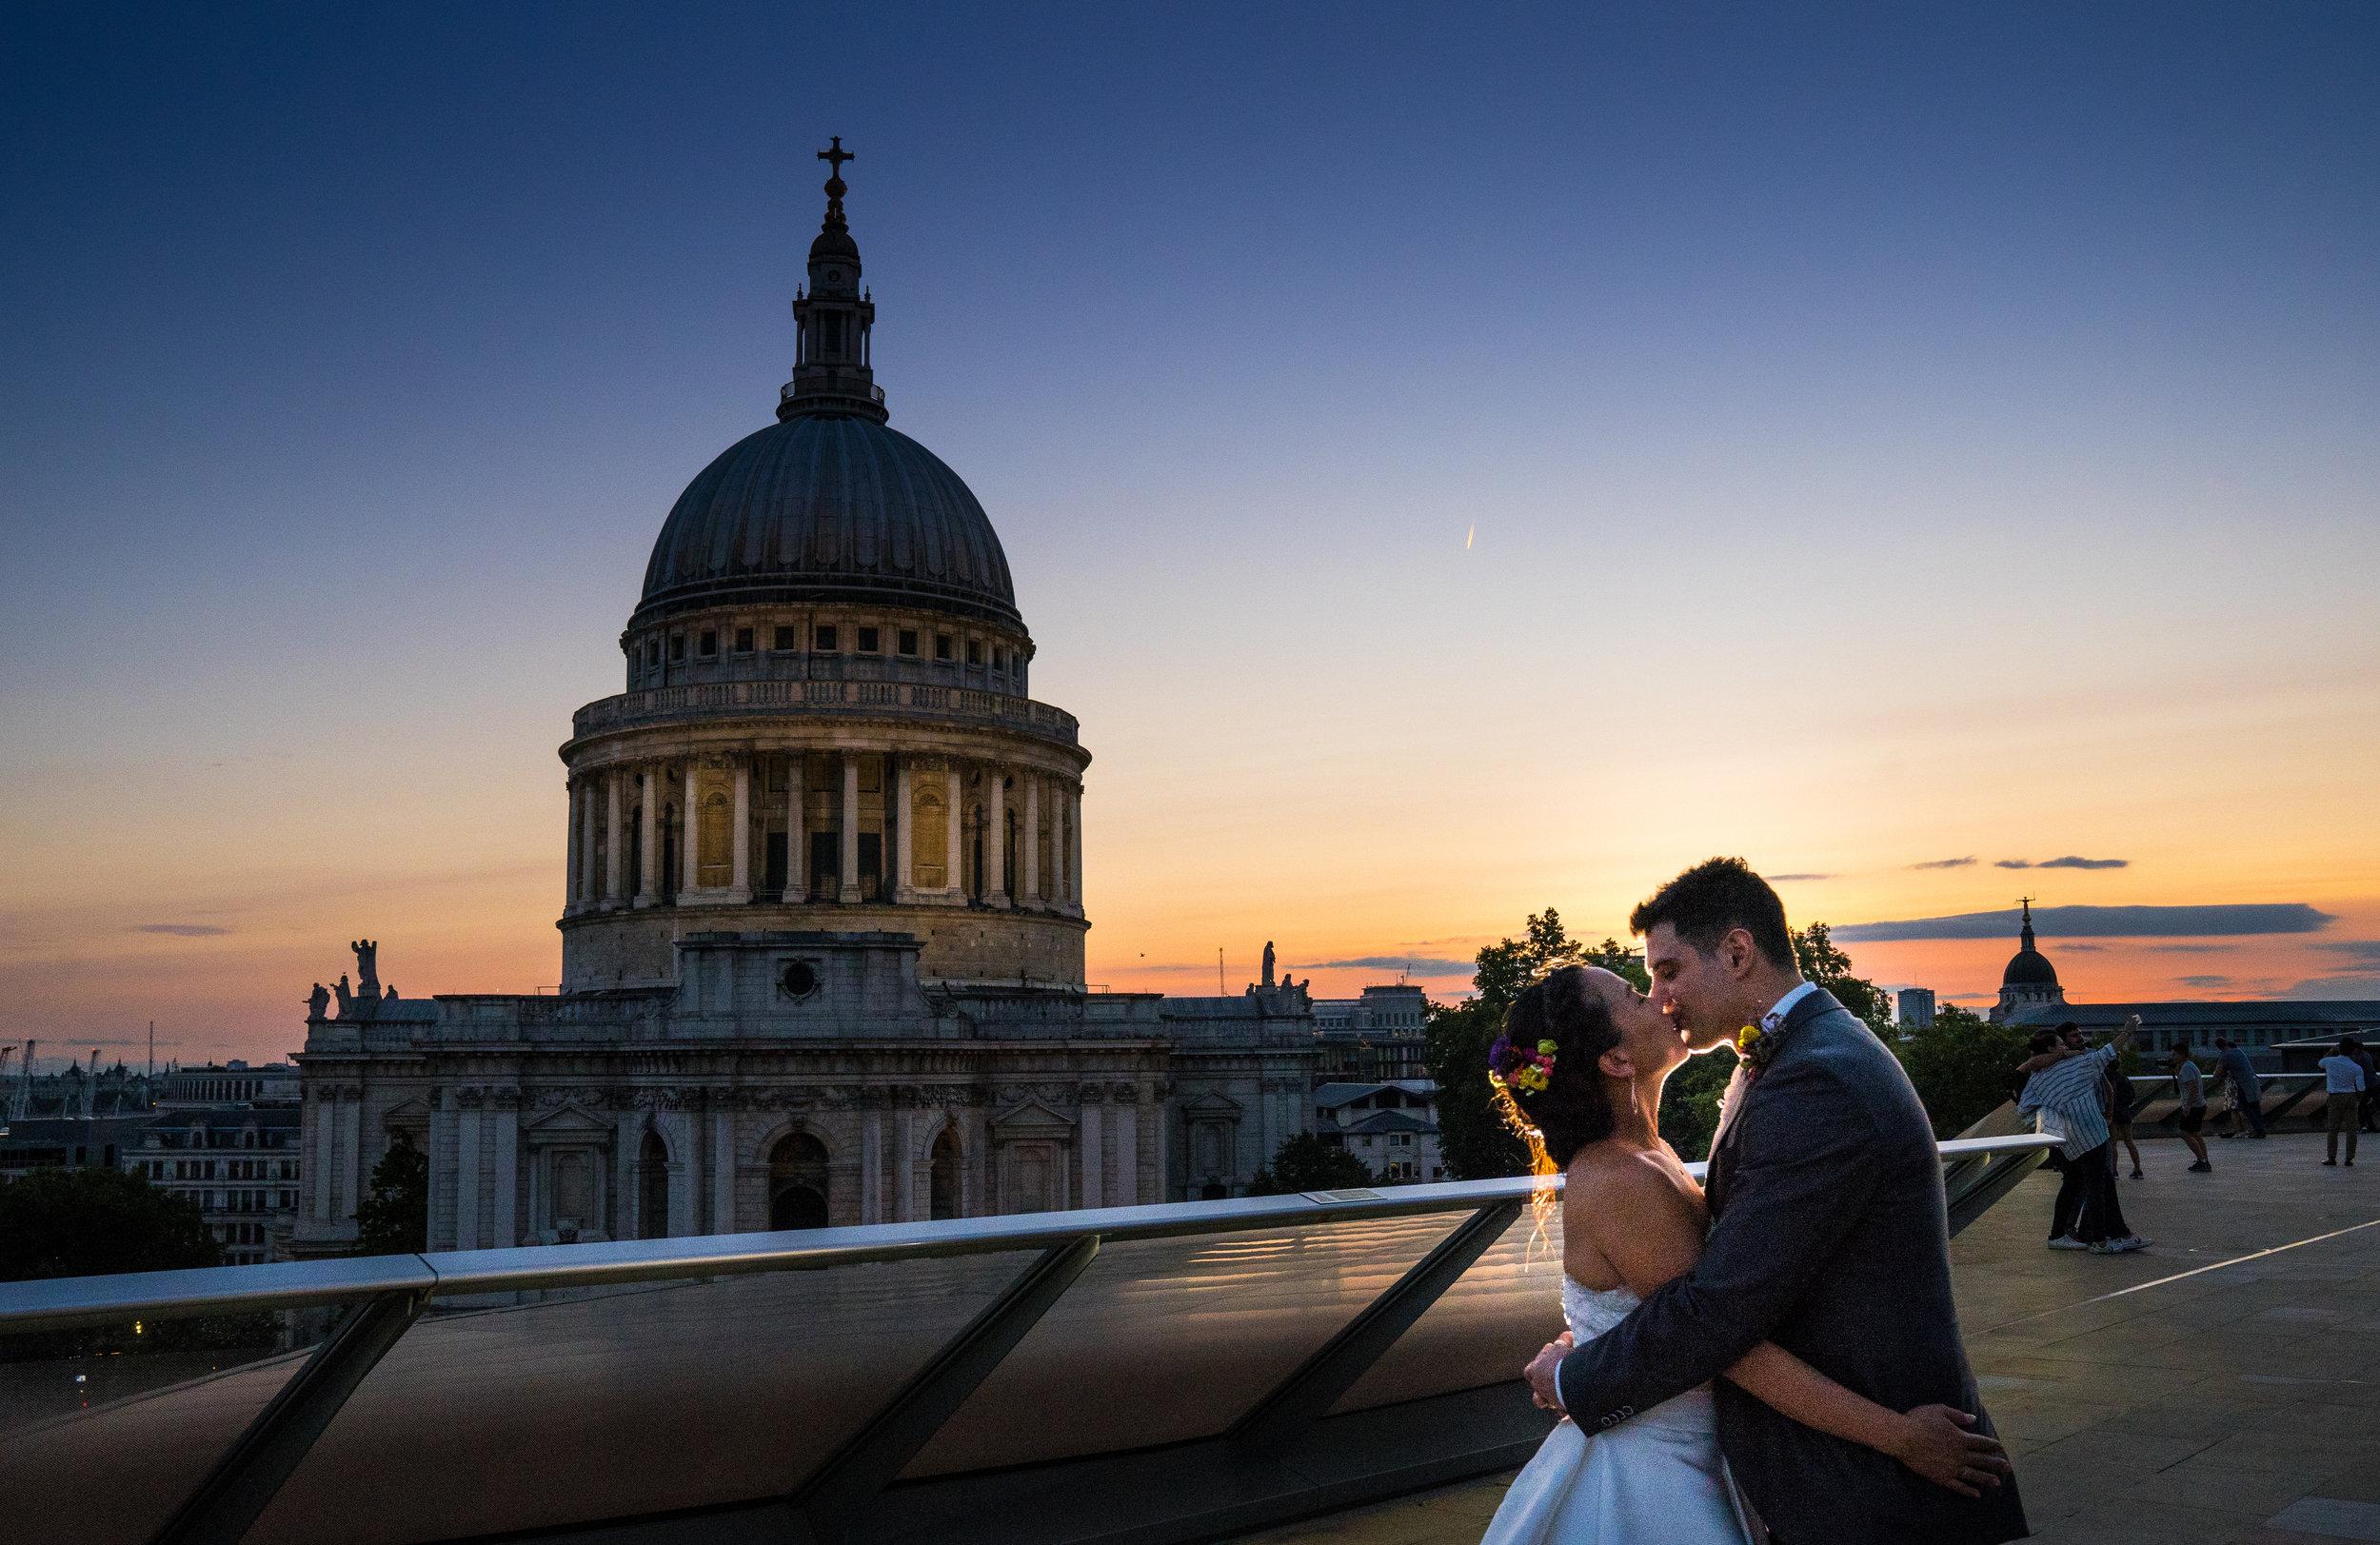 river-rooms-tower-bridge-london-stpauls-mondrian-hotel-wedding-photography-videography-78